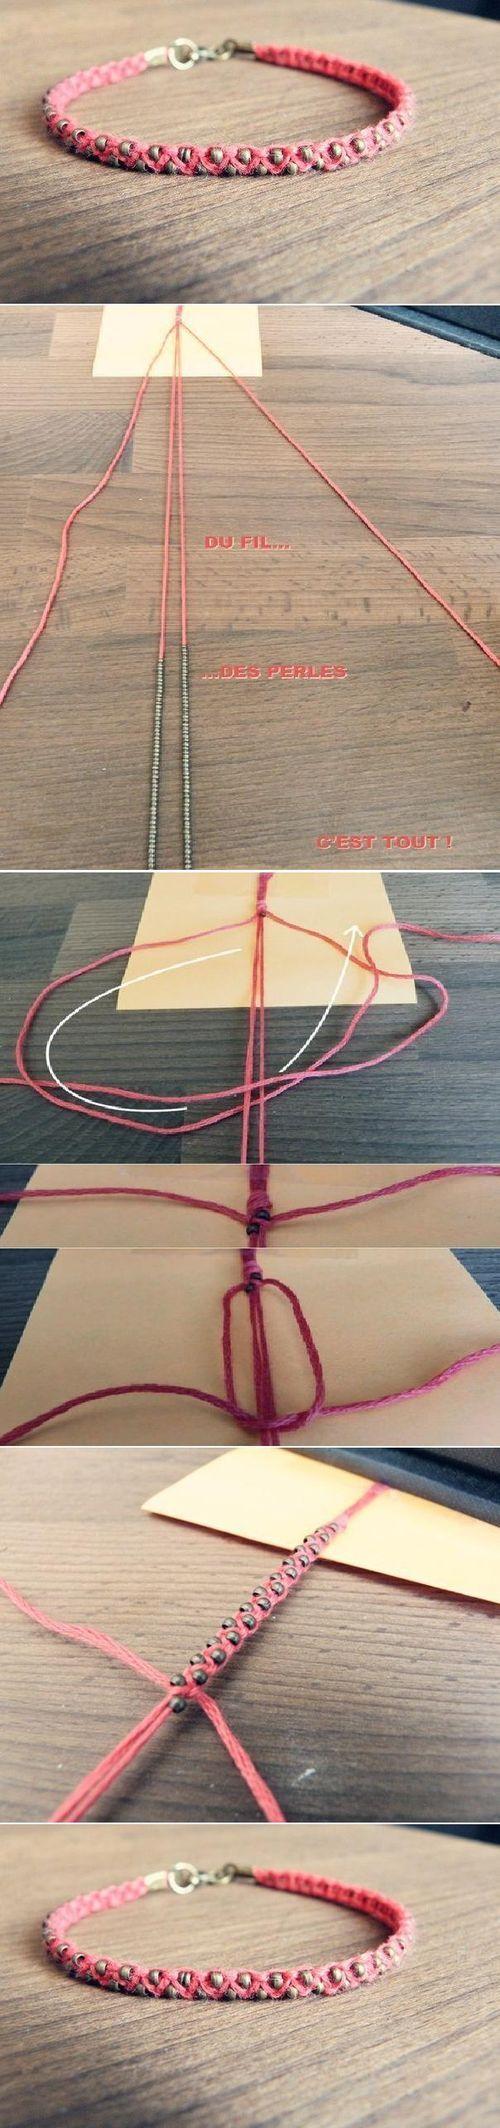 DIY Just a Weave Bracelet DIY Projects / UsefulDIY.com on imgfave